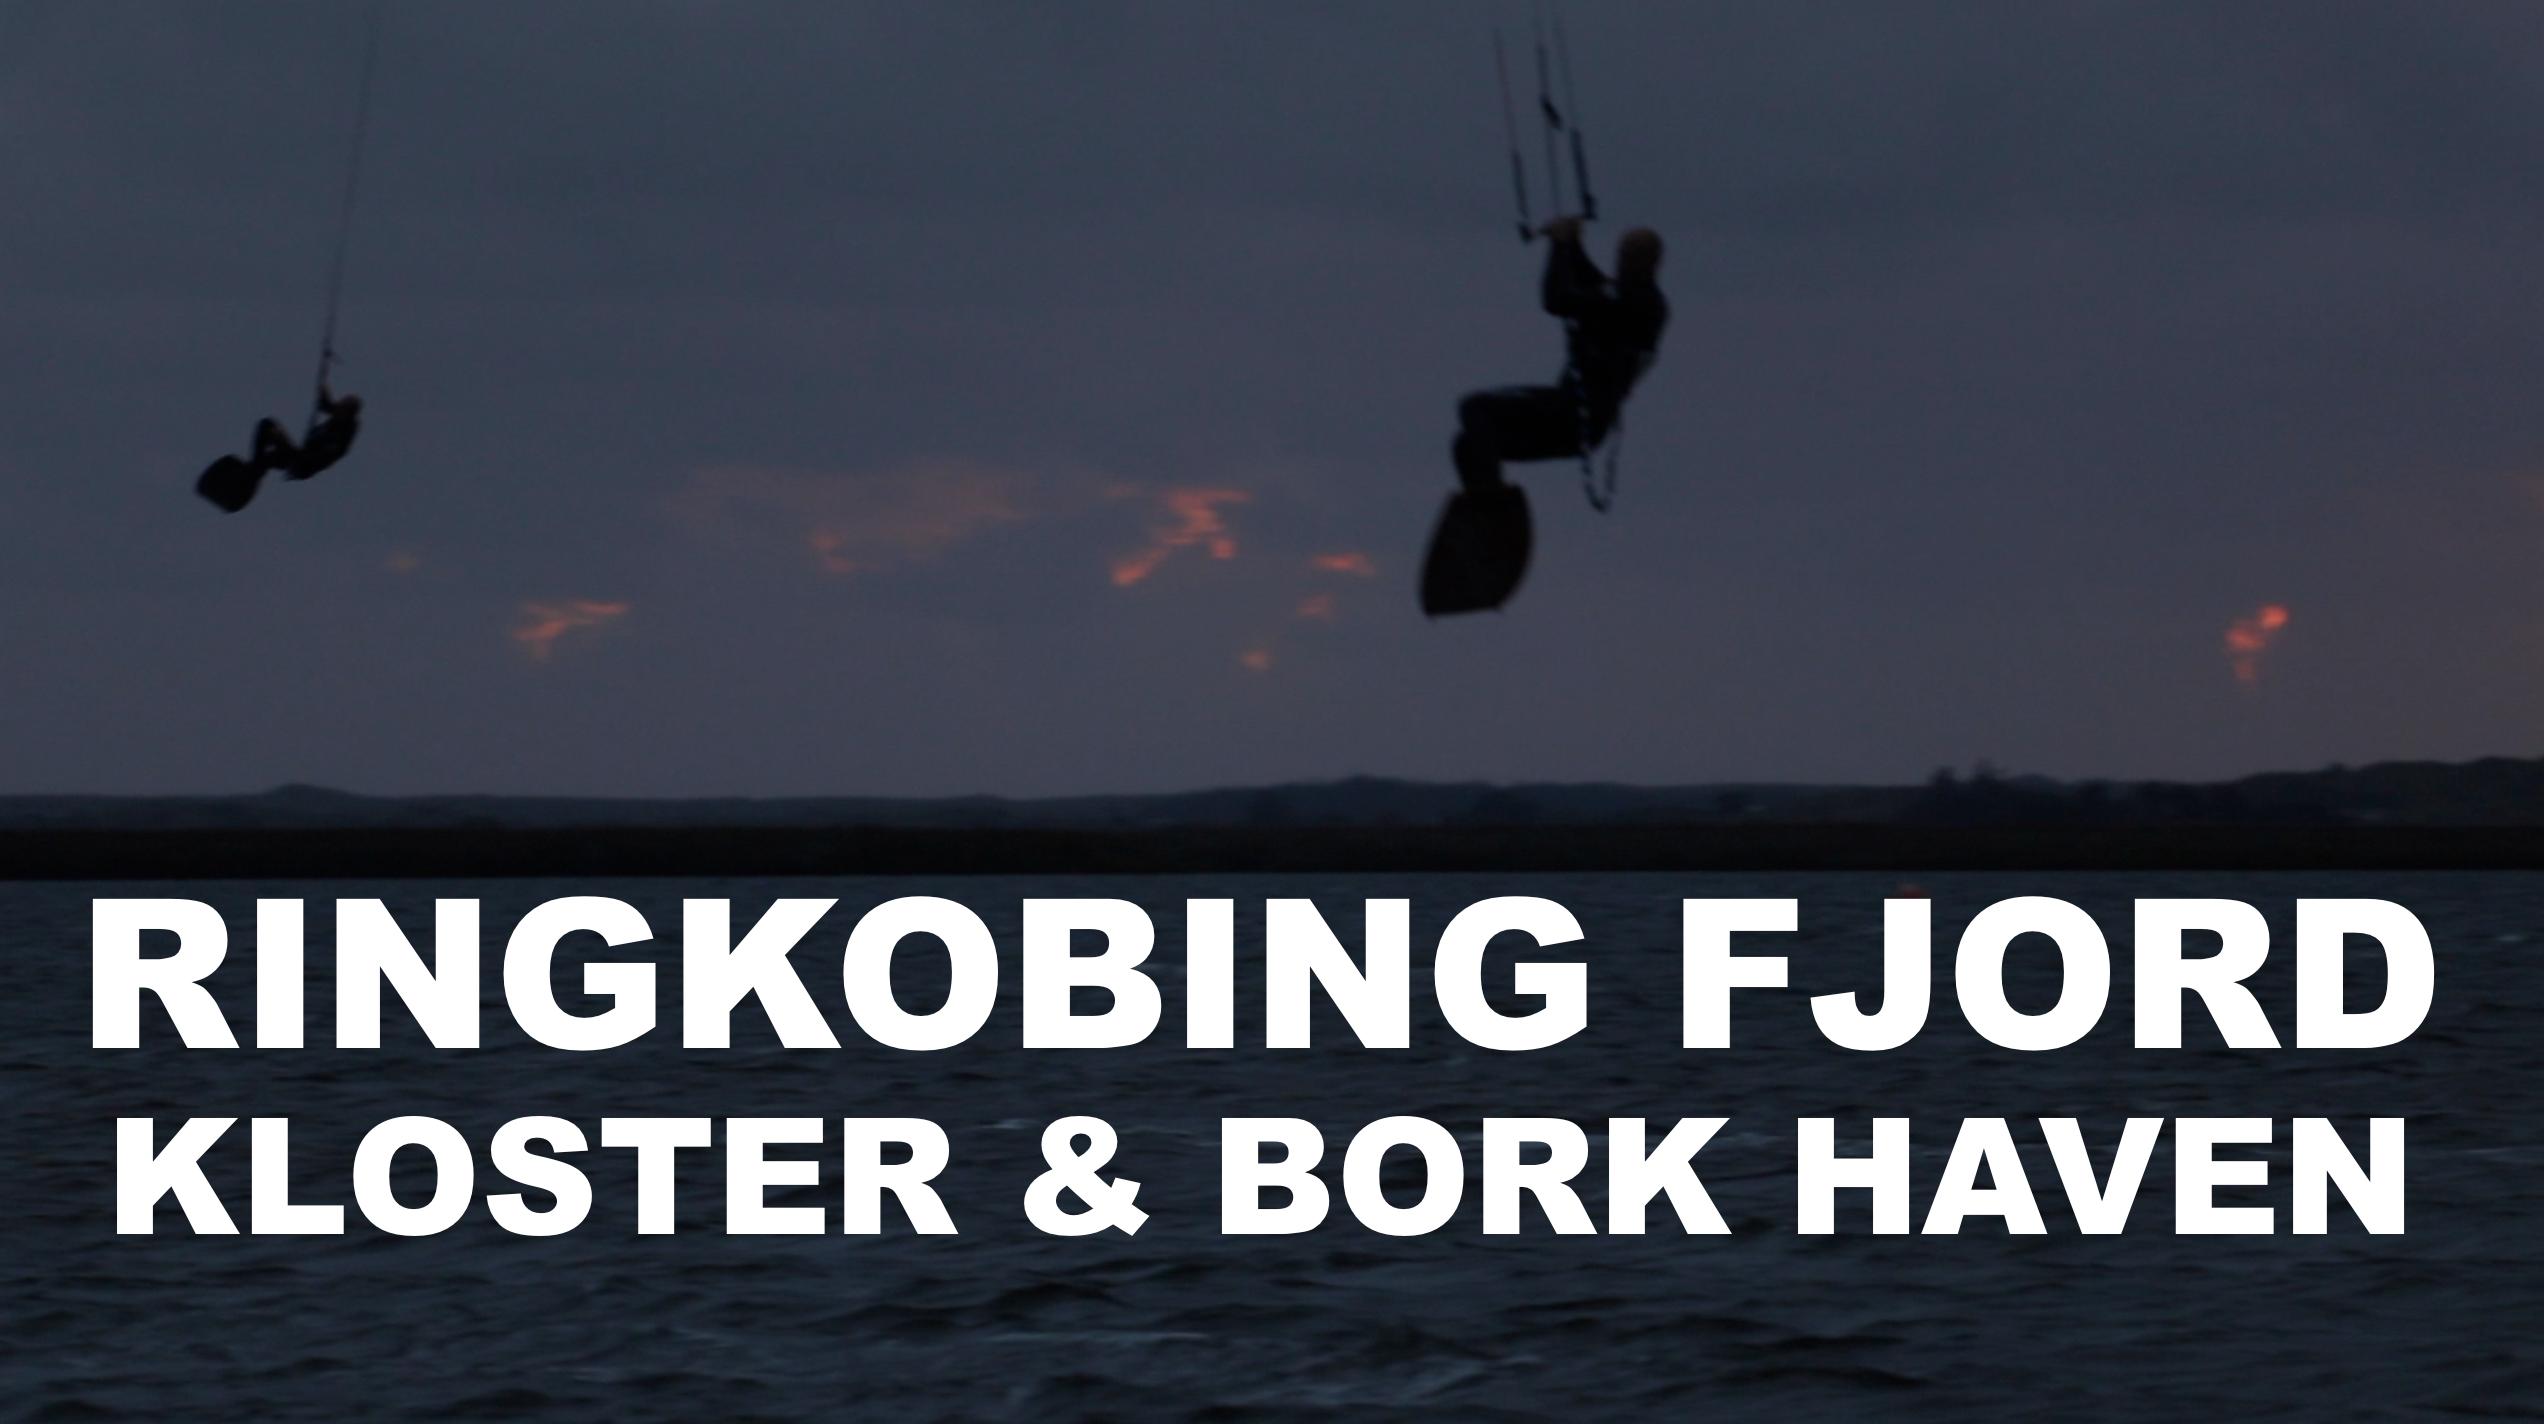 KITESPOT RINGKOBING FJORD KLOSTER / BORK HAVN